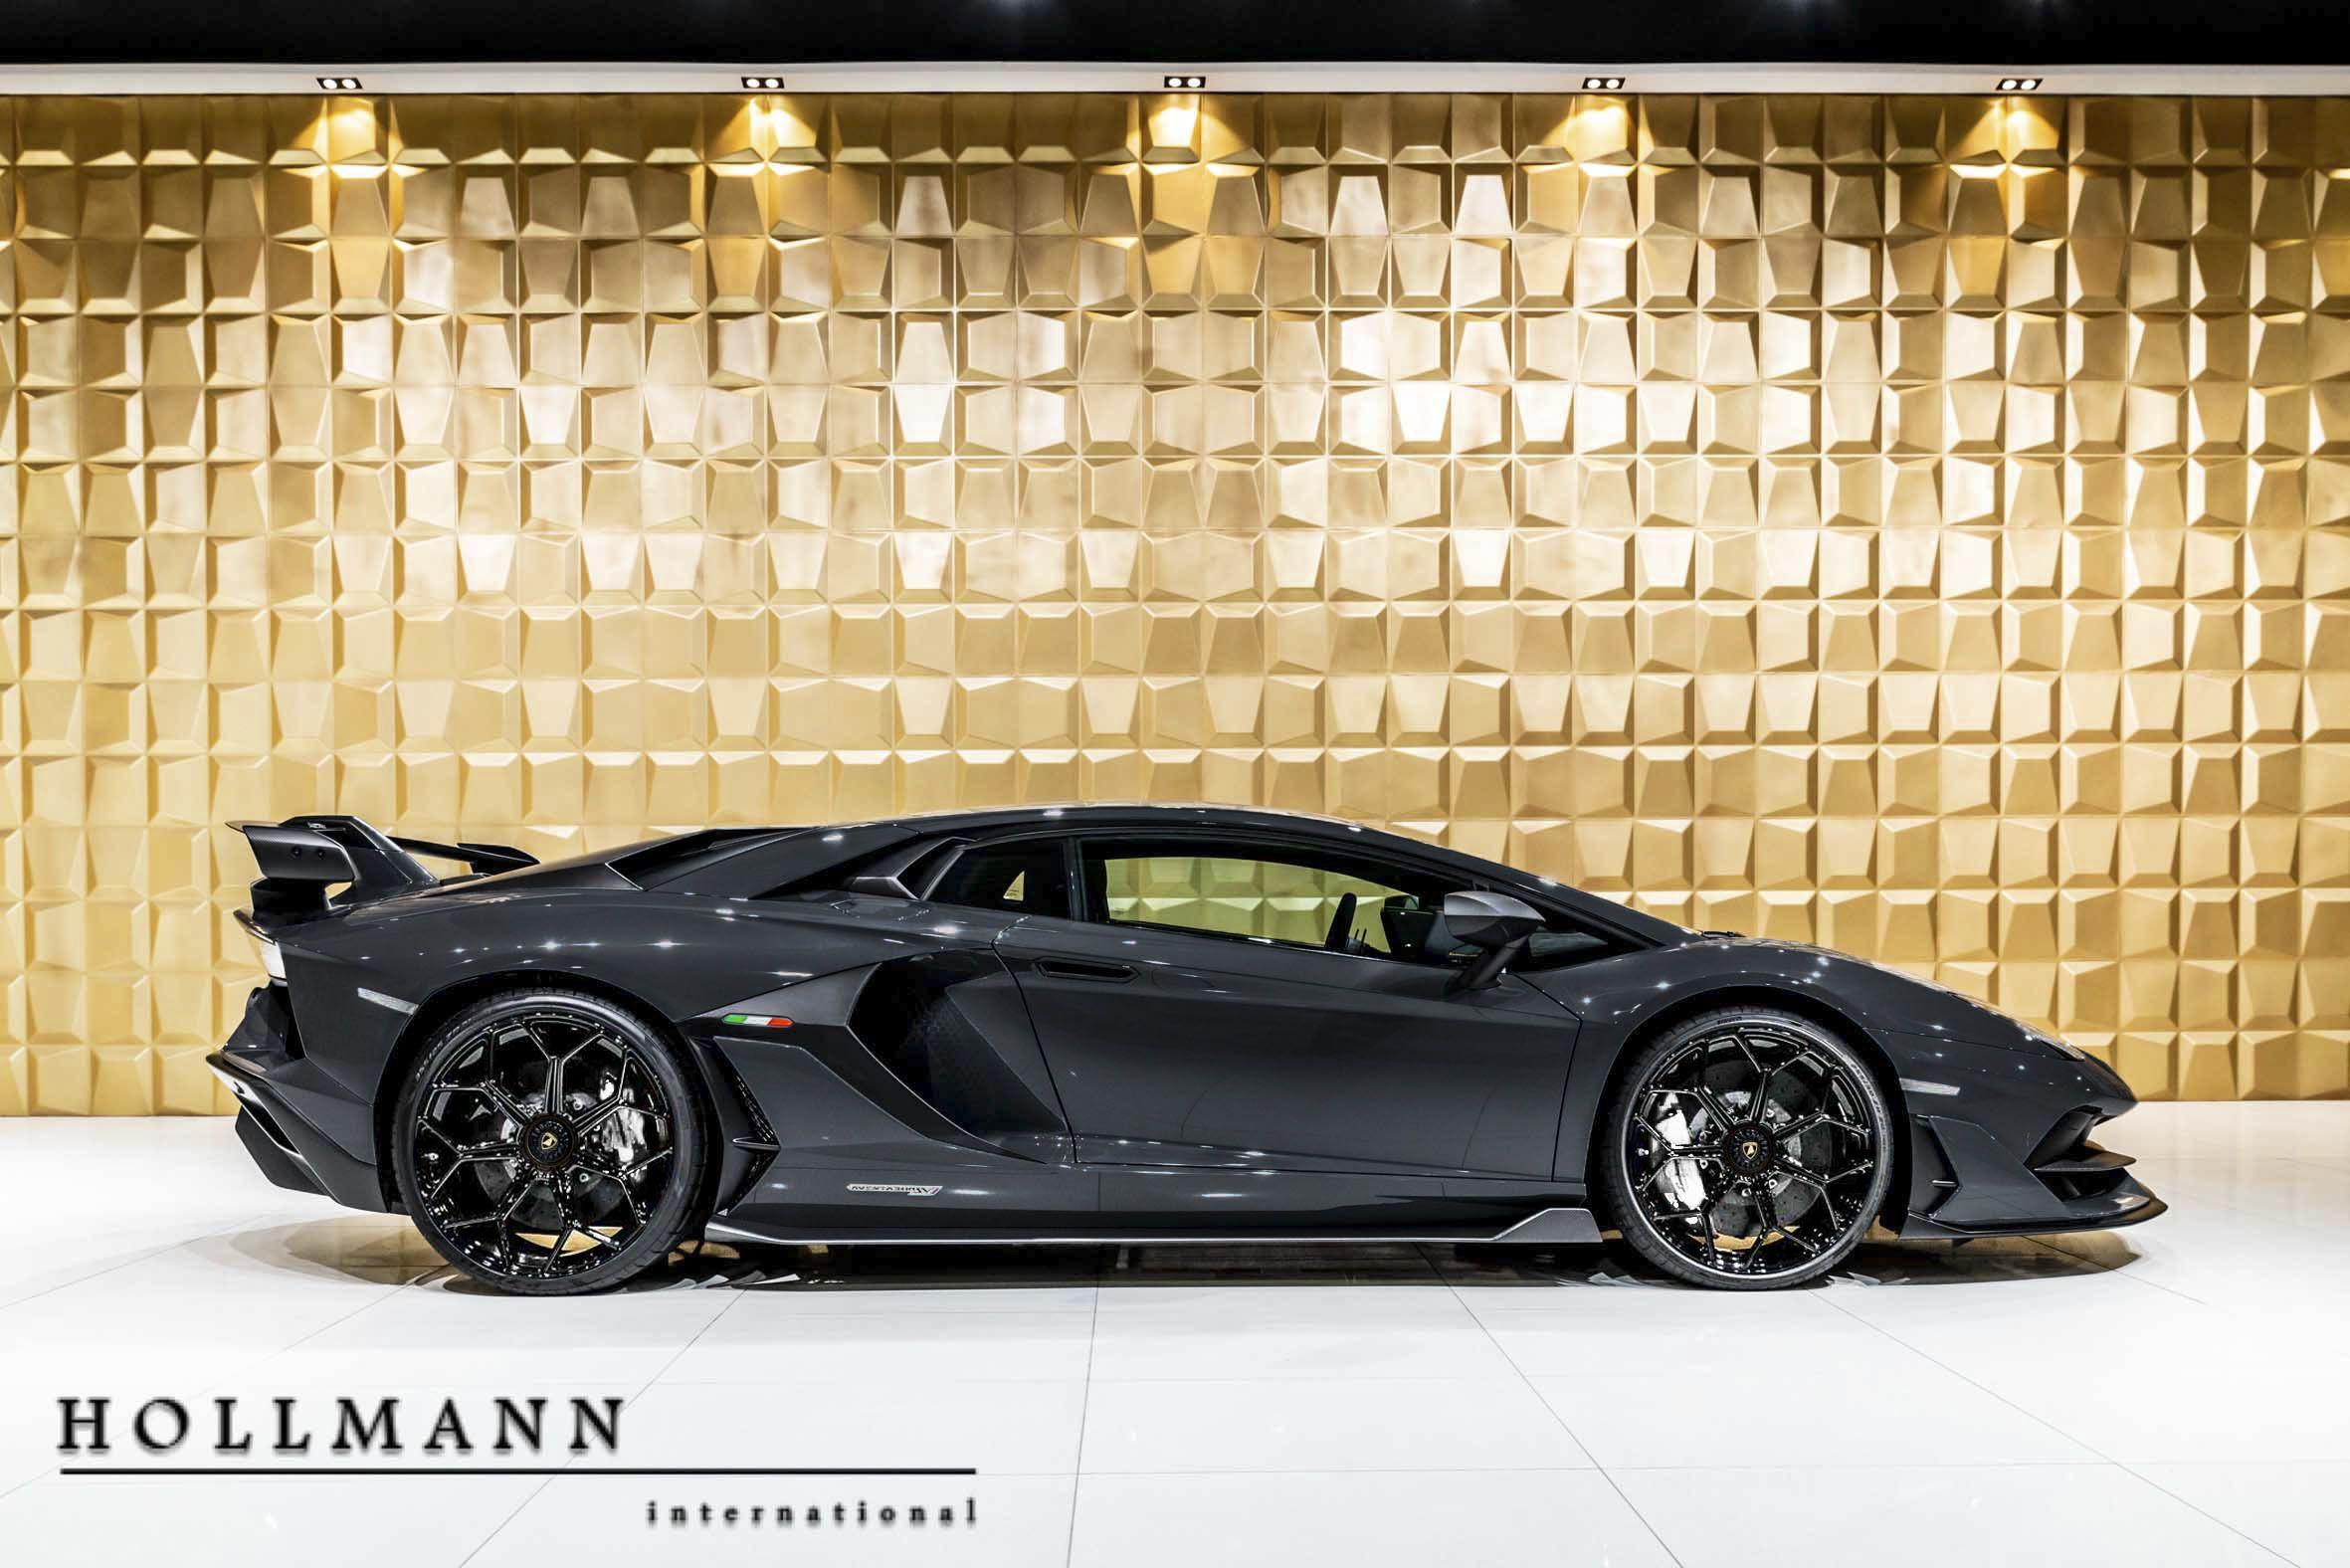 lamborghini aventador svj luxury pulse cars germany for sale on luxurypulse lamborghini aventador lamborghini lamborghini cars lamborghini aventador svj luxury